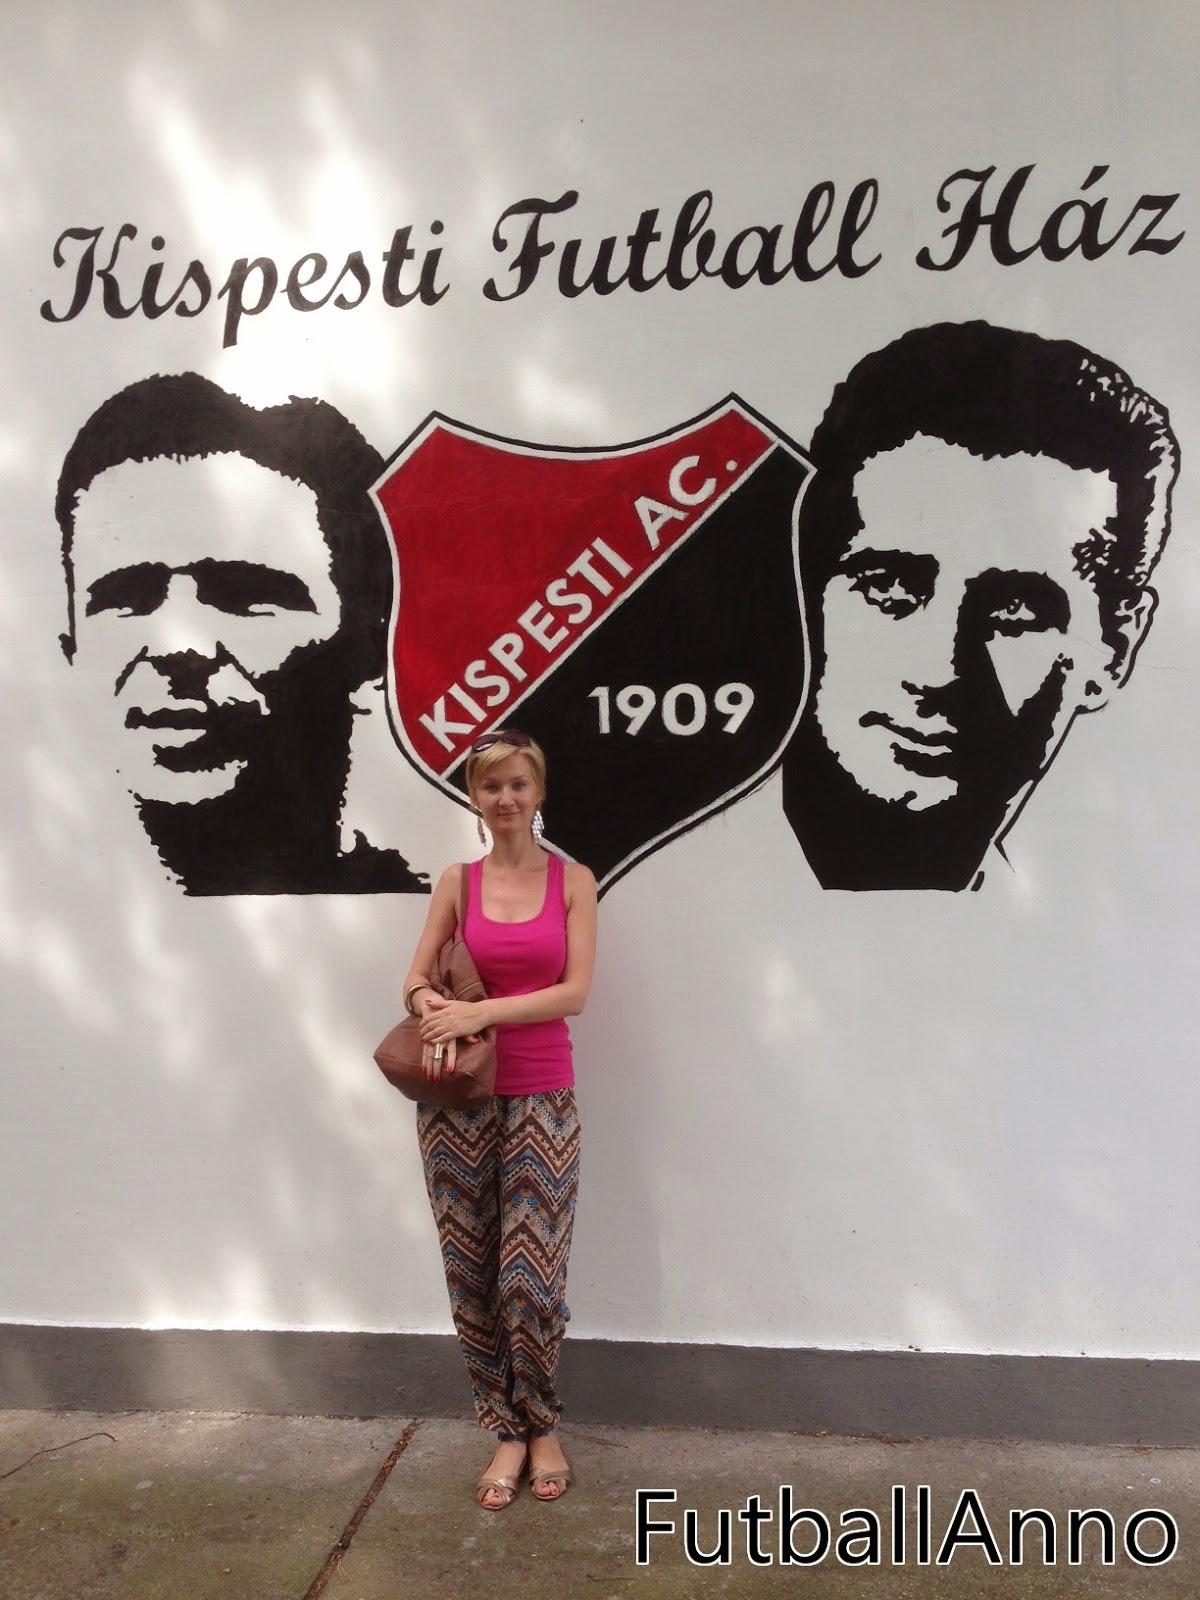 FUTBALL ANNO A Kispesti Futball Házban jártam